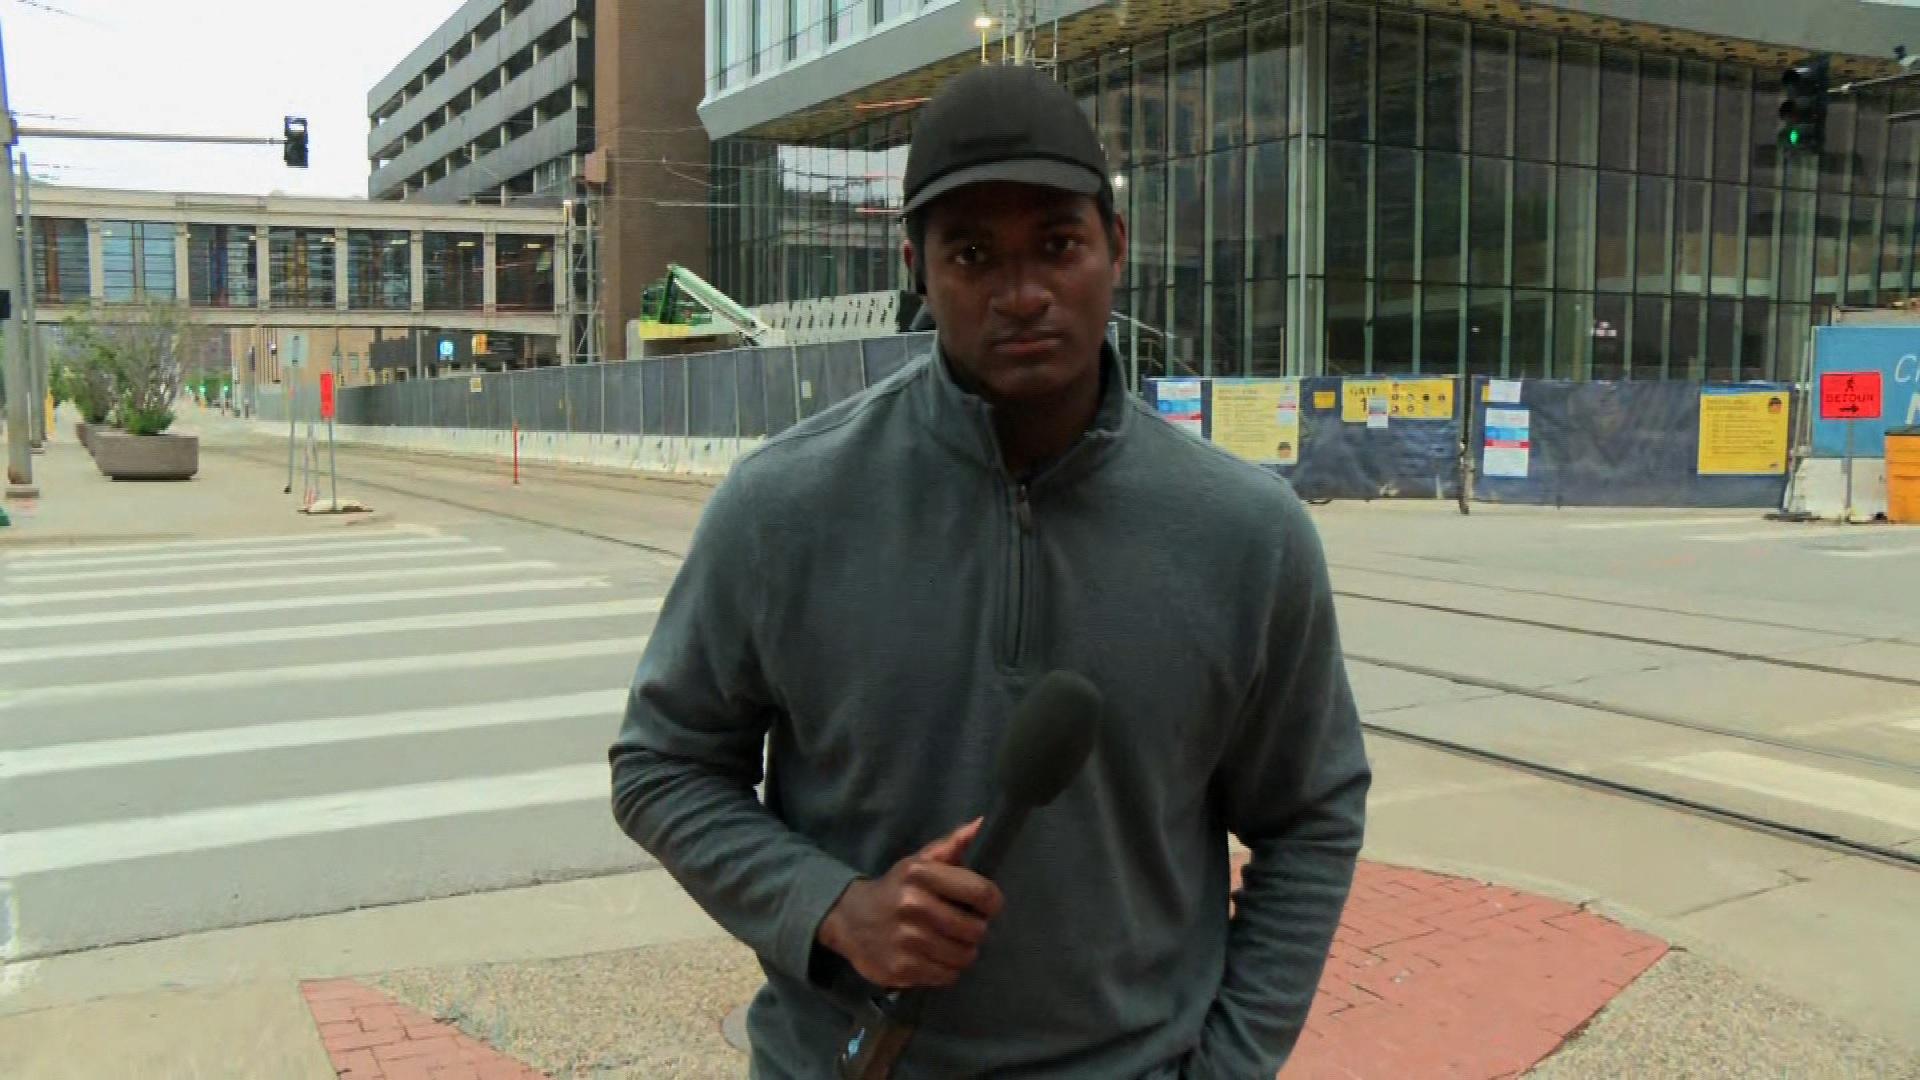 CNN黑人记者已被释放 明尼苏达州州长道歉